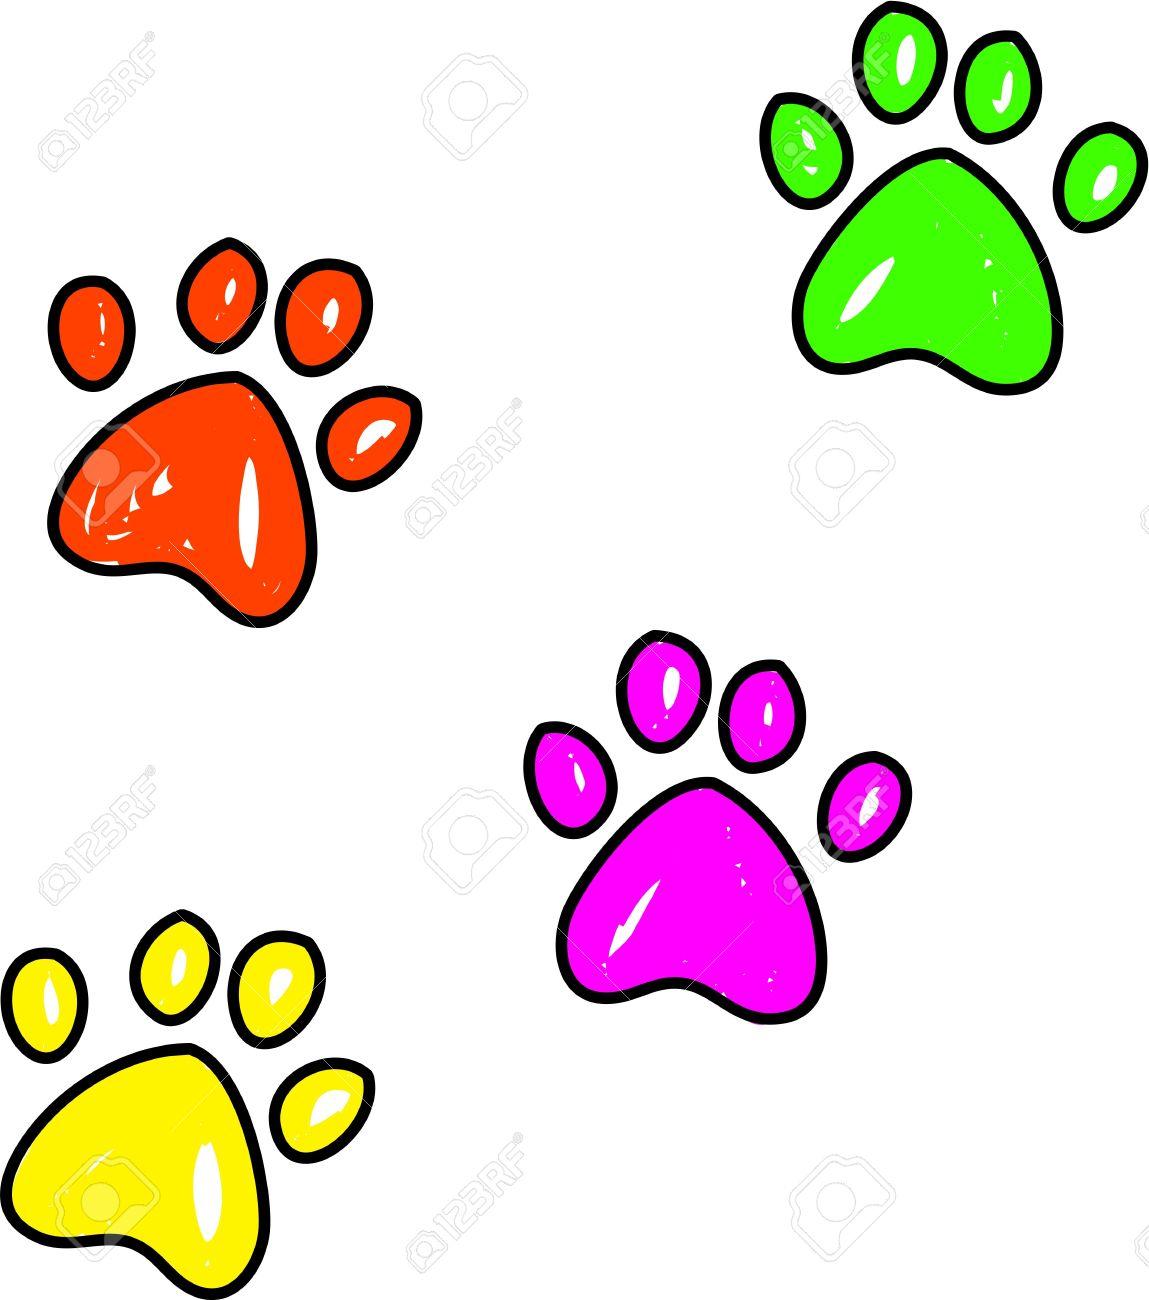 1149x1300 Drawing Of Dog Paw Prints Drawn Puppy Paw Print